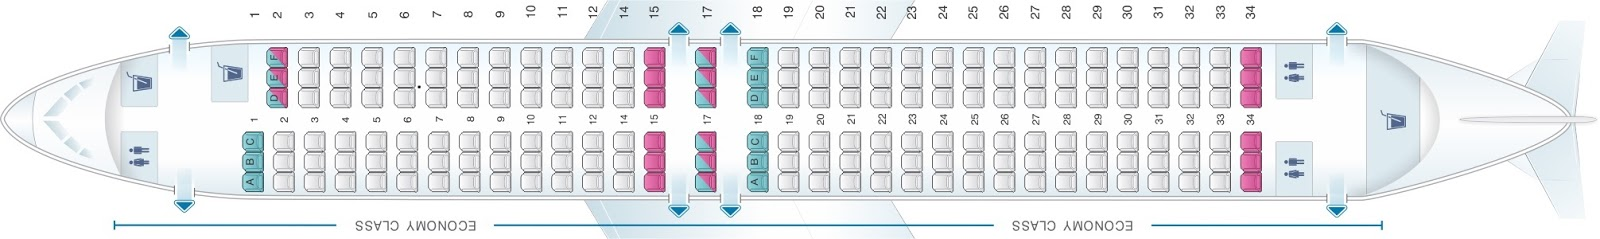 Sunexpress sitzplan. boeing 737 800 sunexpress sitzplan